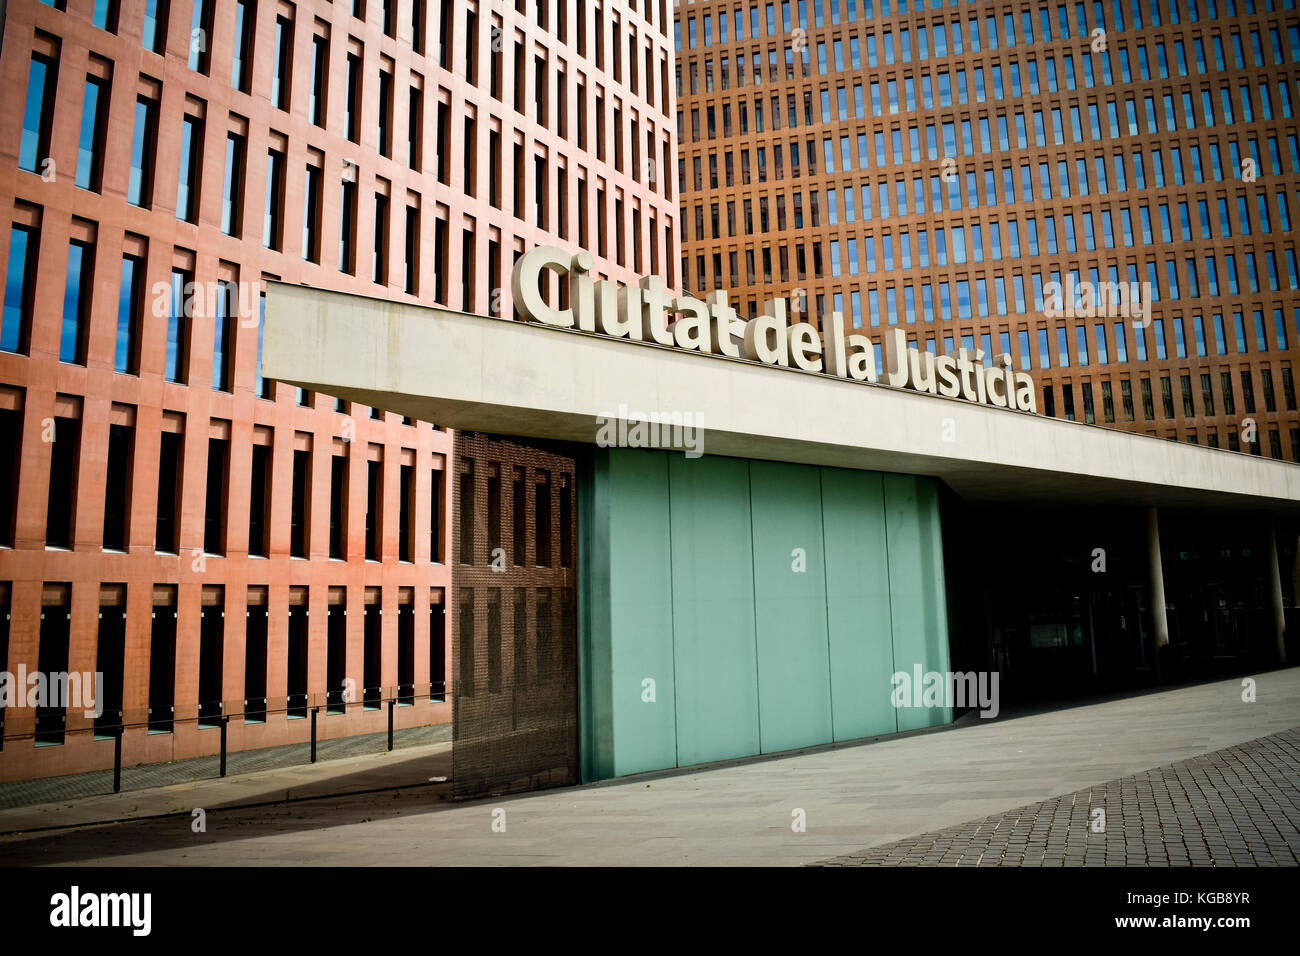 Ciutat de la Justicia. Barcelona, Catalonia, Spain. - Stock Image